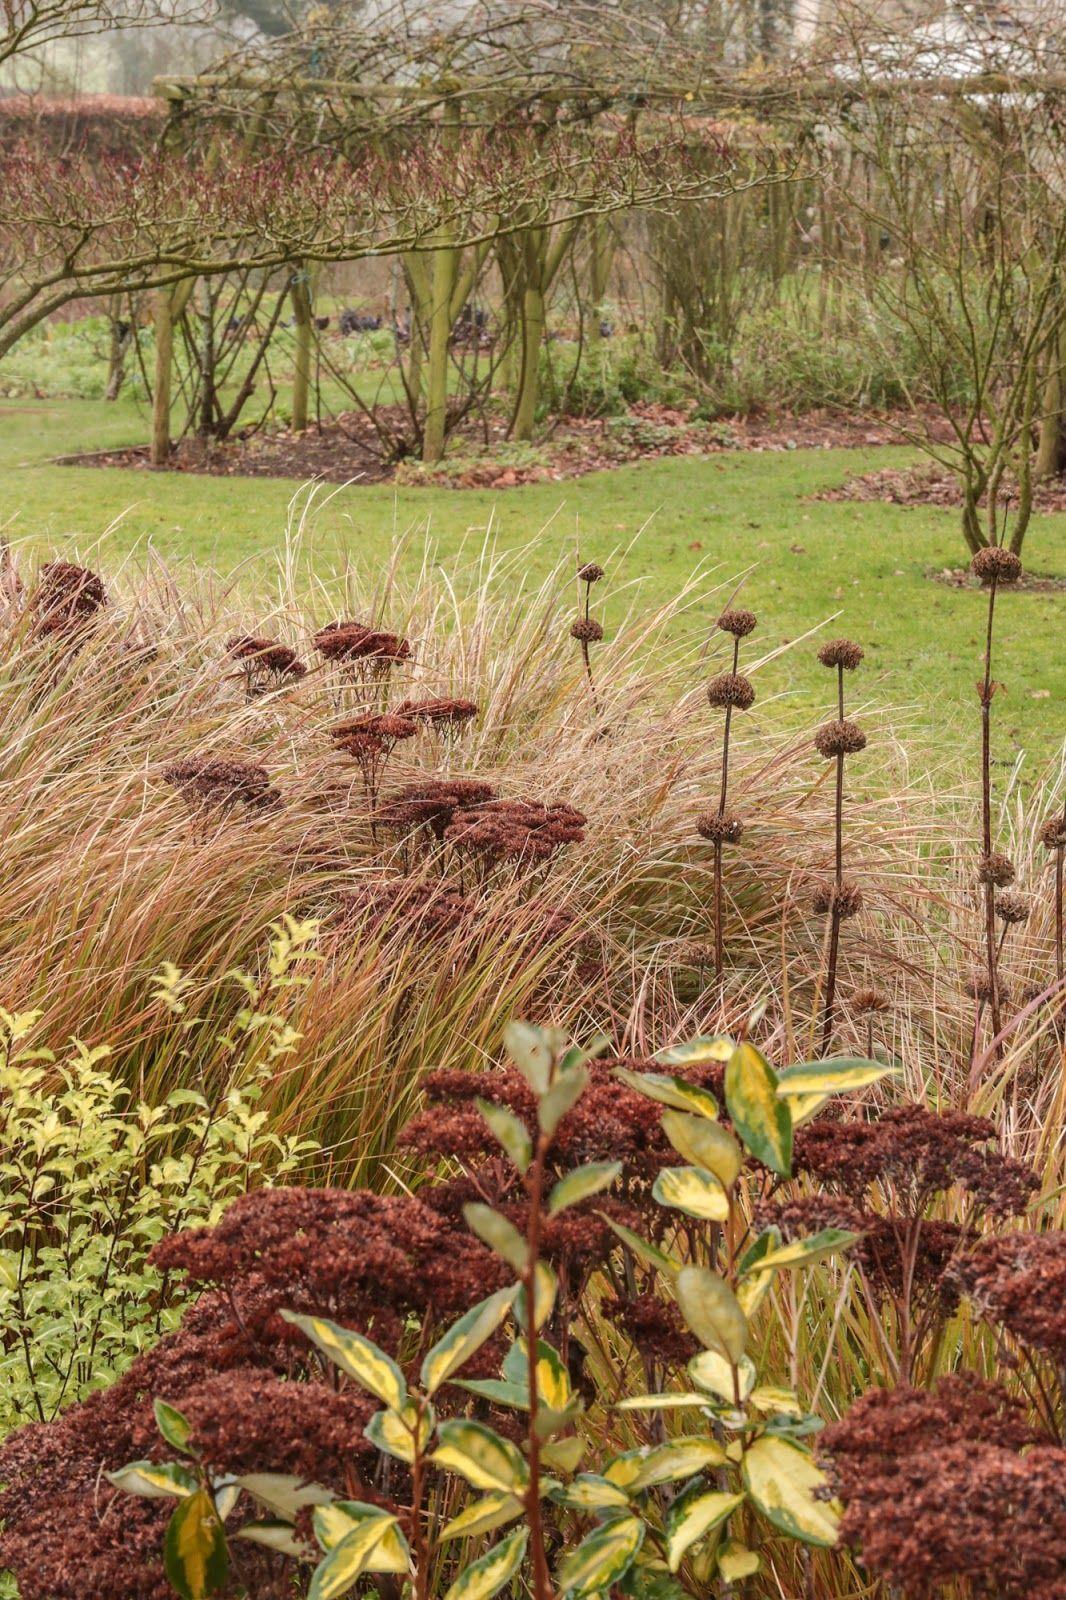 Glädjekällans Trädgårdsblogg #GardenBorders | Garden Borders ...